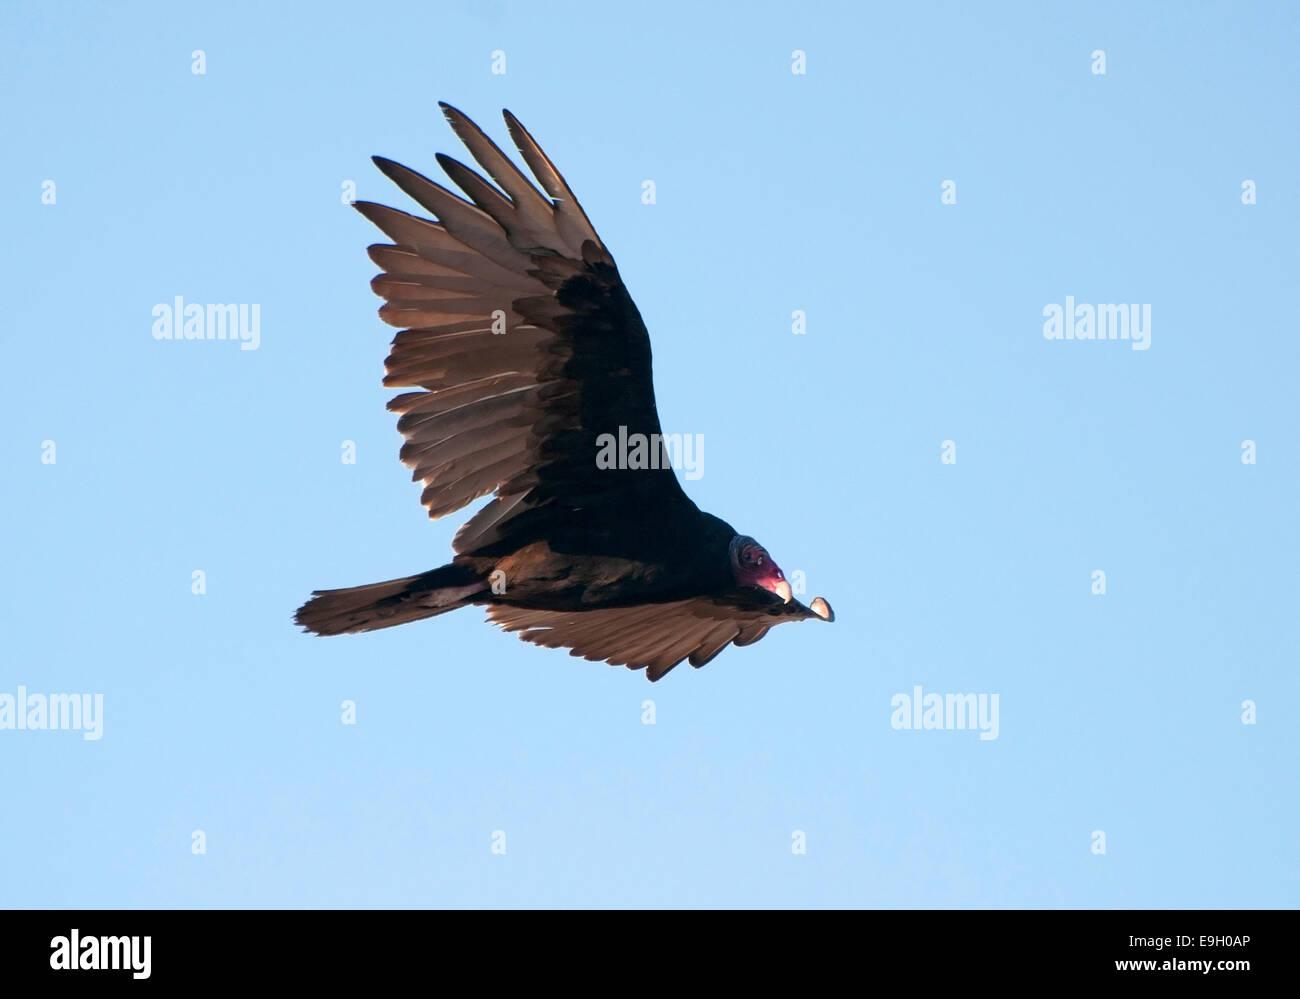 Turkey Vulture, Cathartes aura, Flying - Stock Image